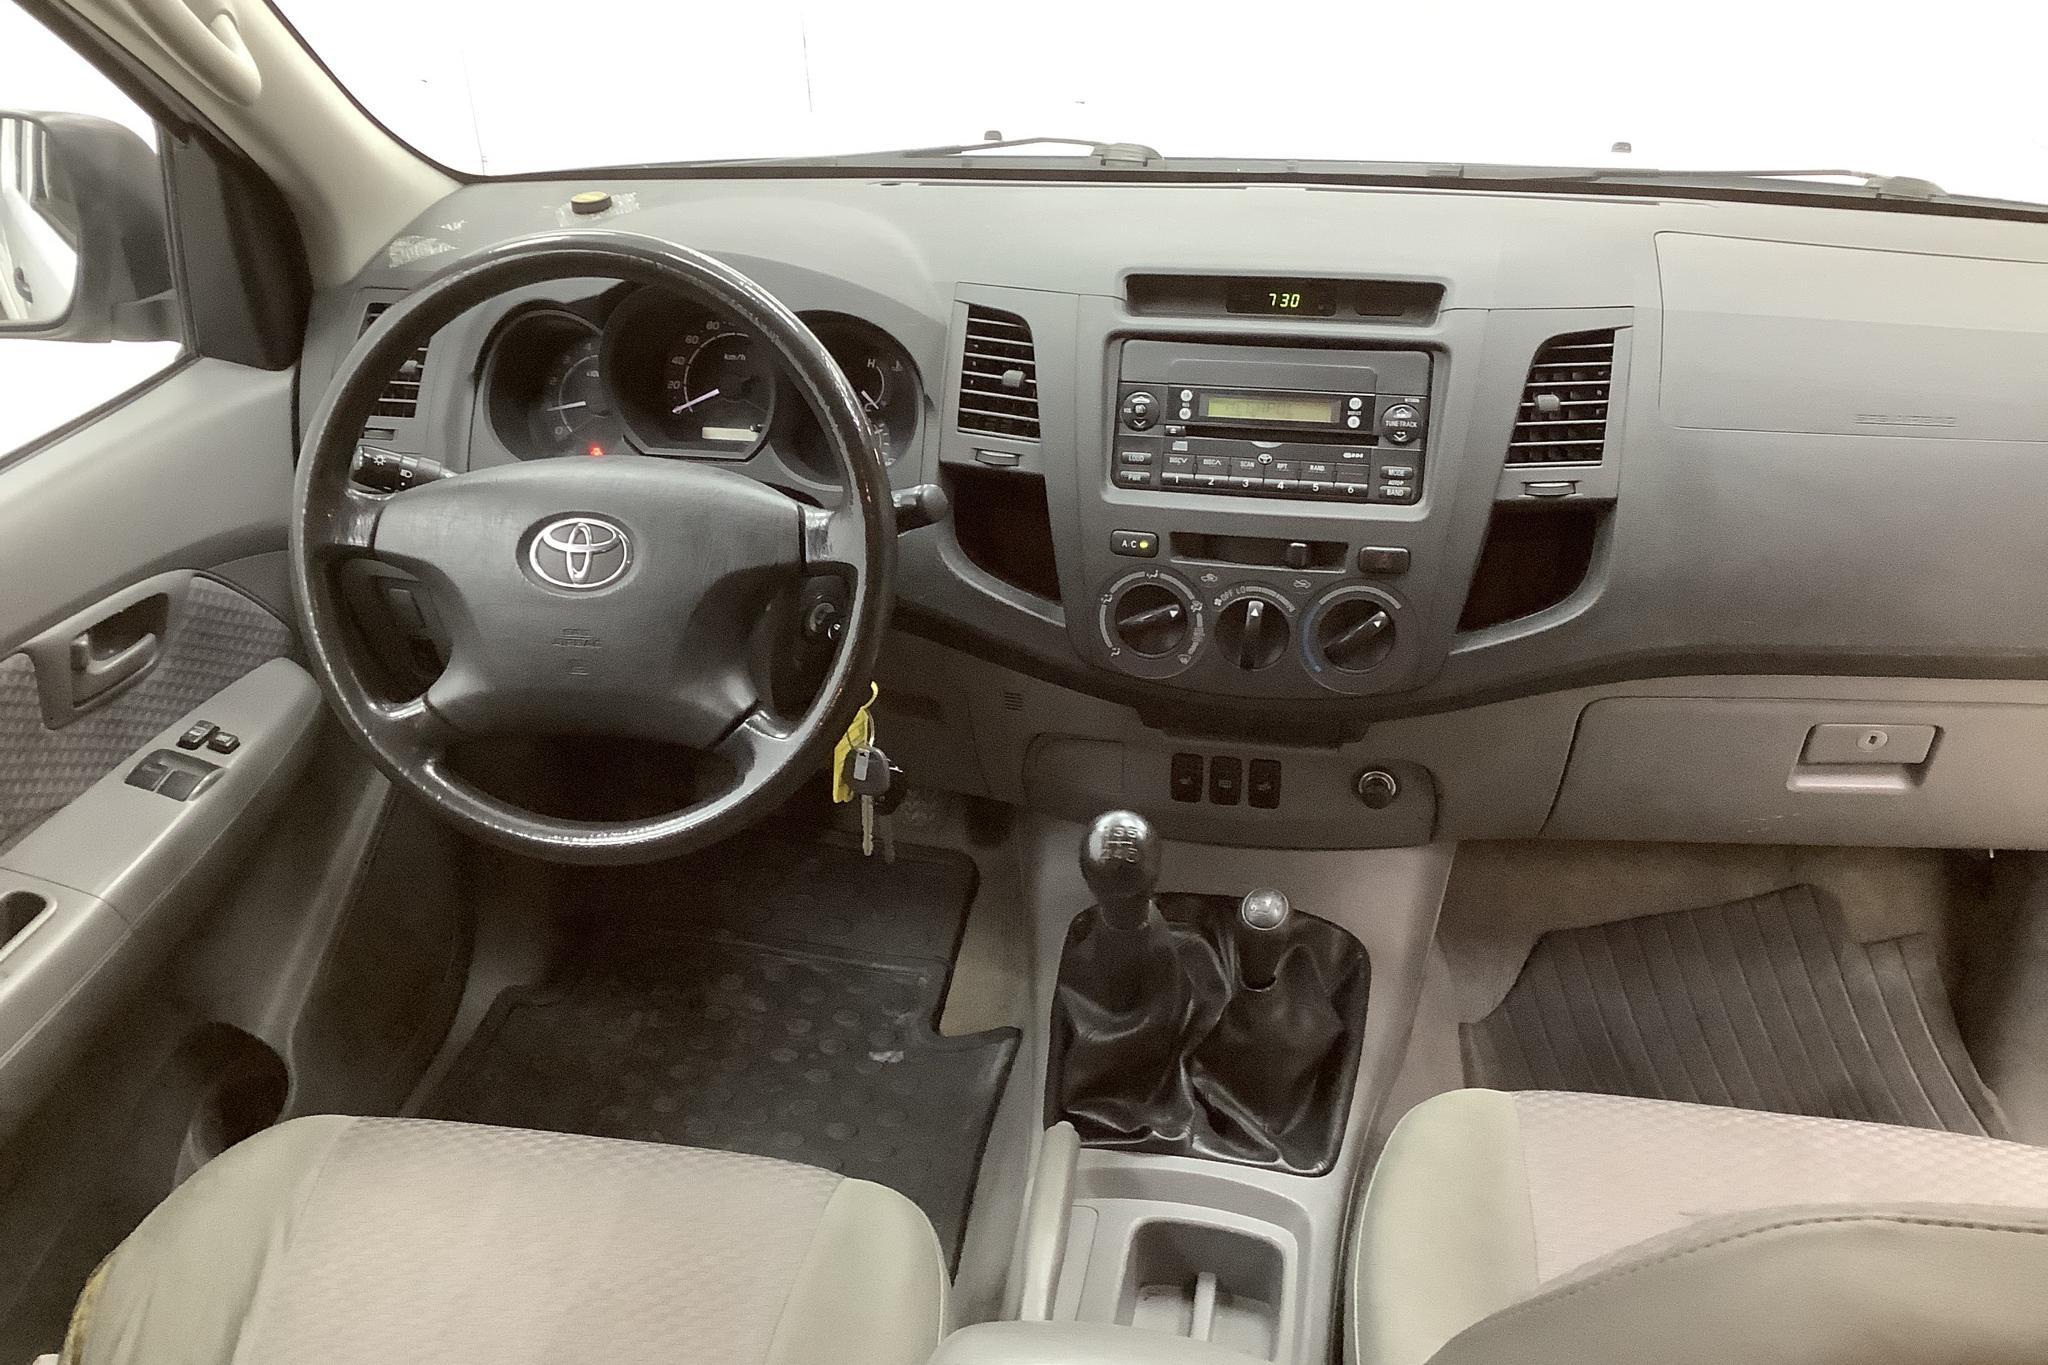 Toyota Hilux 2.5 D-4D 4WD (120hk) - 19 583 mil - Manuell - vit - 2008